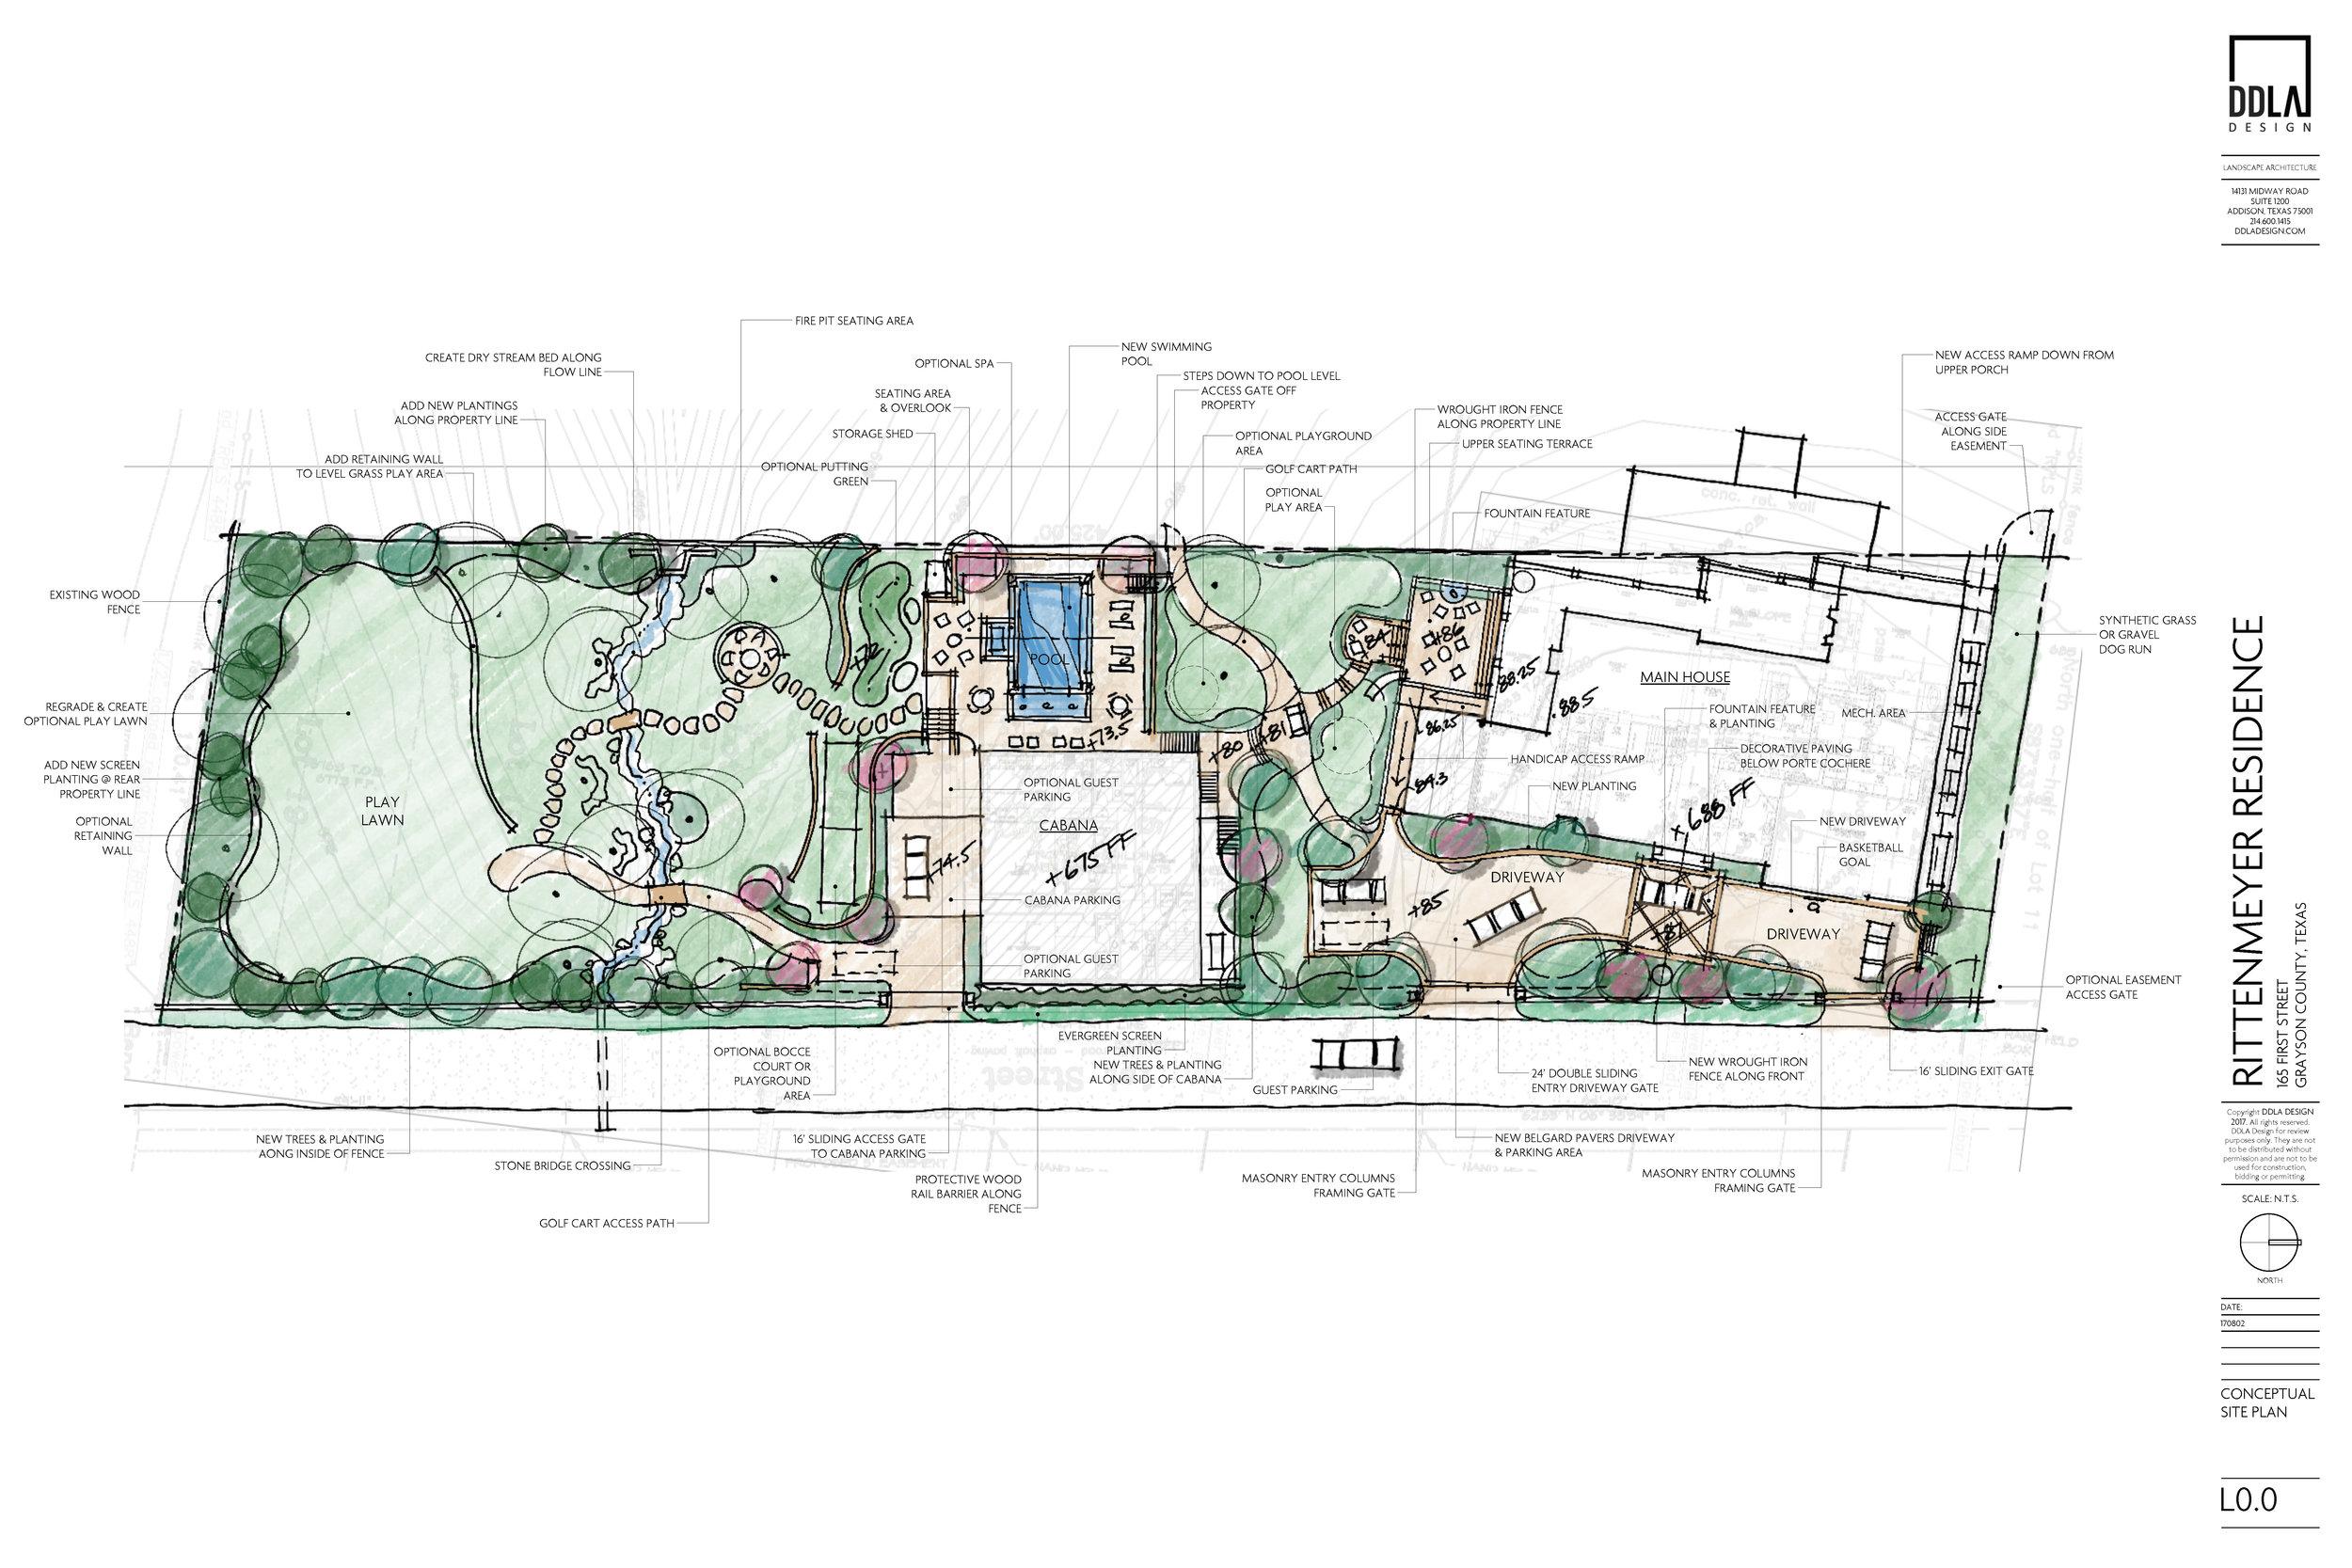 170802 rittenmeyer_conceptual site plan.jpg